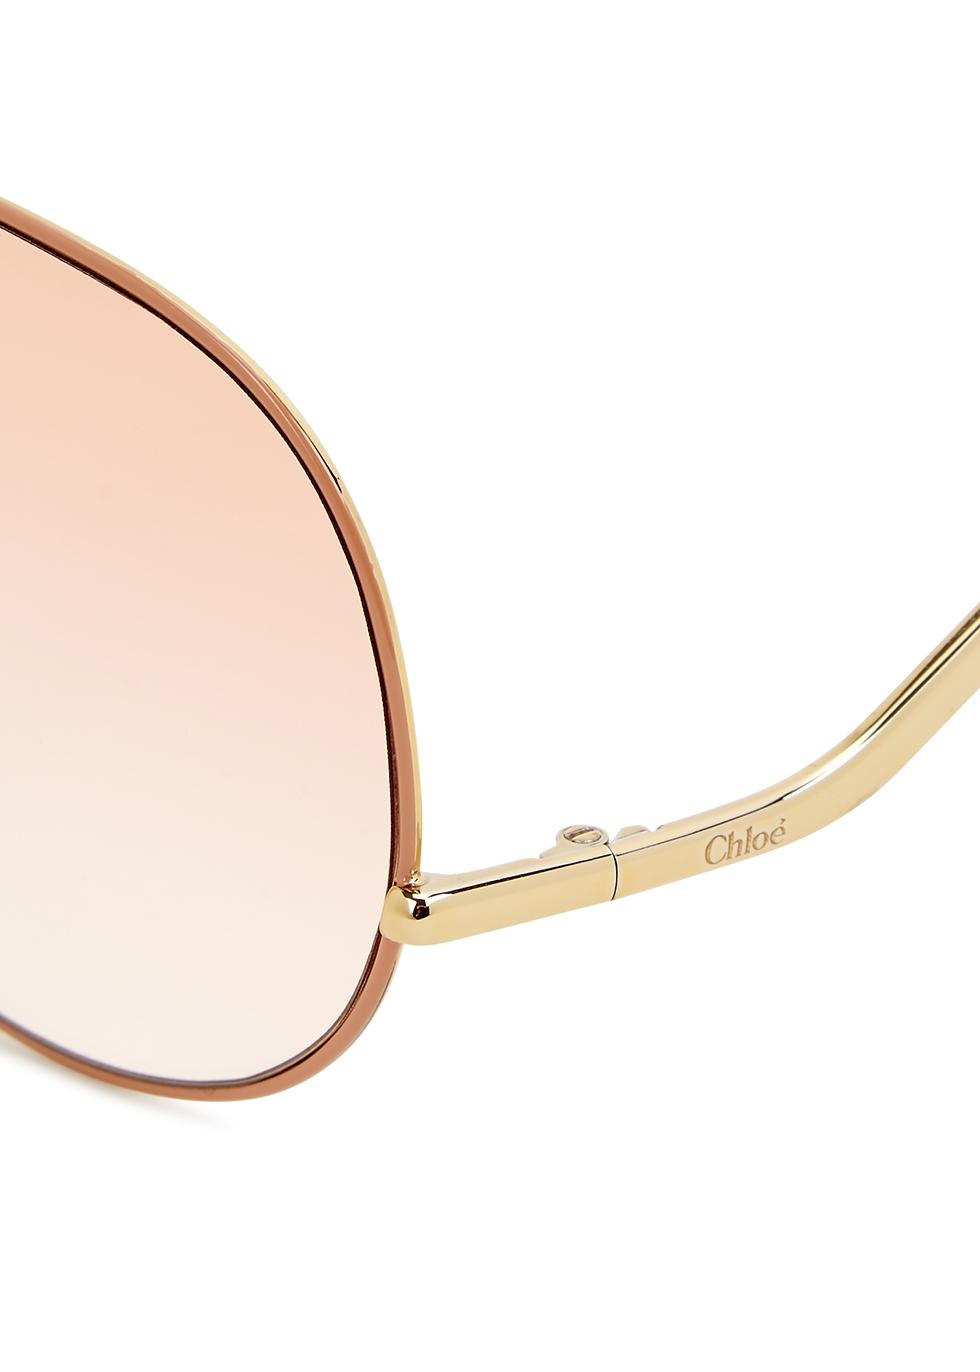 Gold-tone aviator-style sunglasses - Chloé